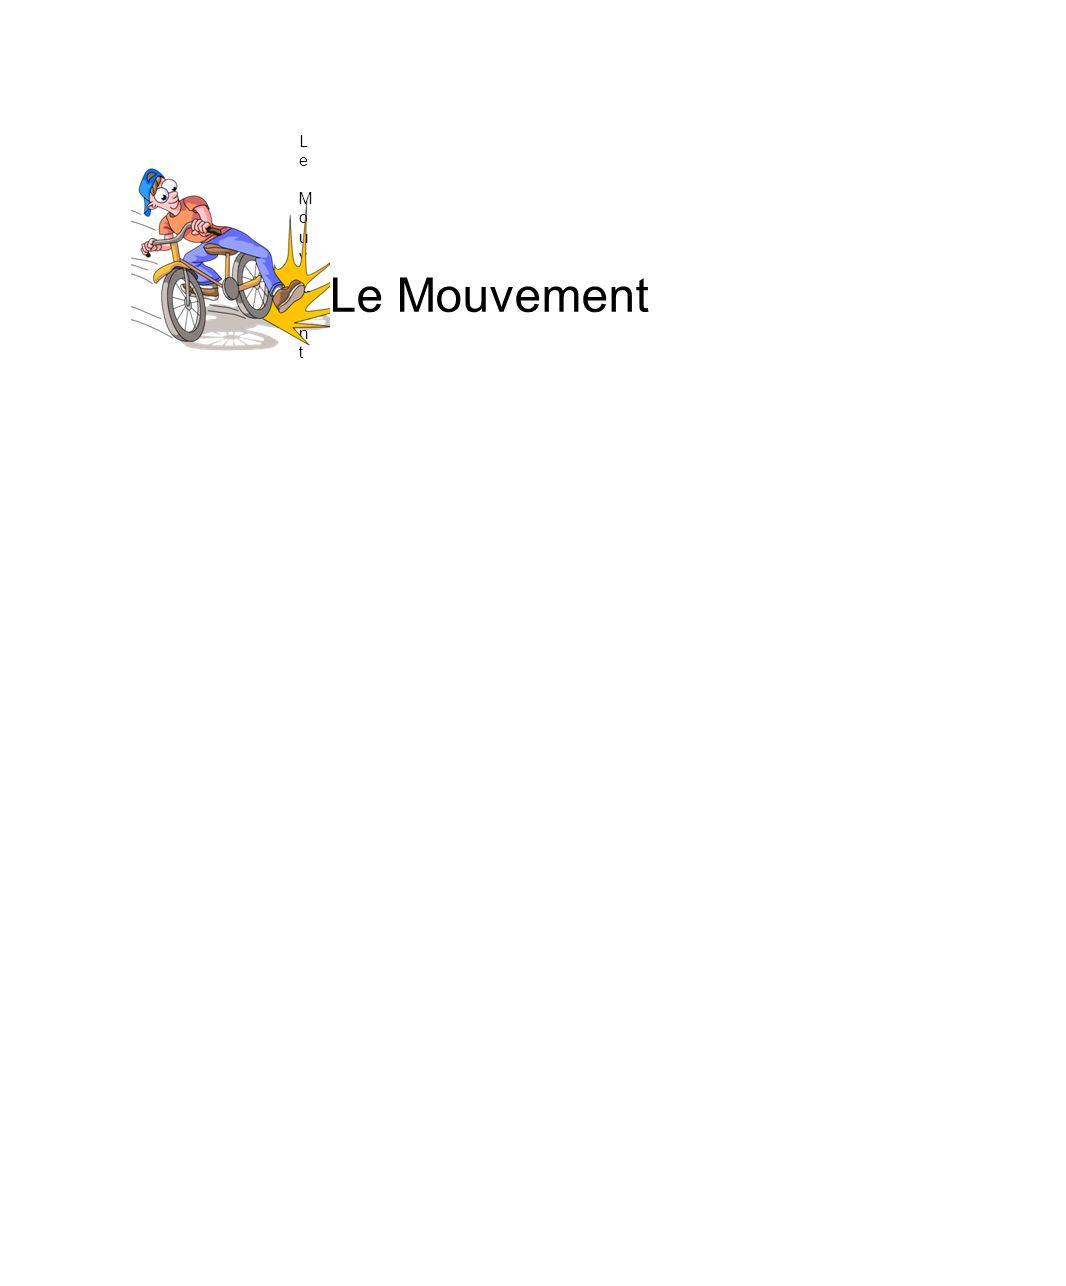 Le MouvementLe Mouvement Le Mouvement